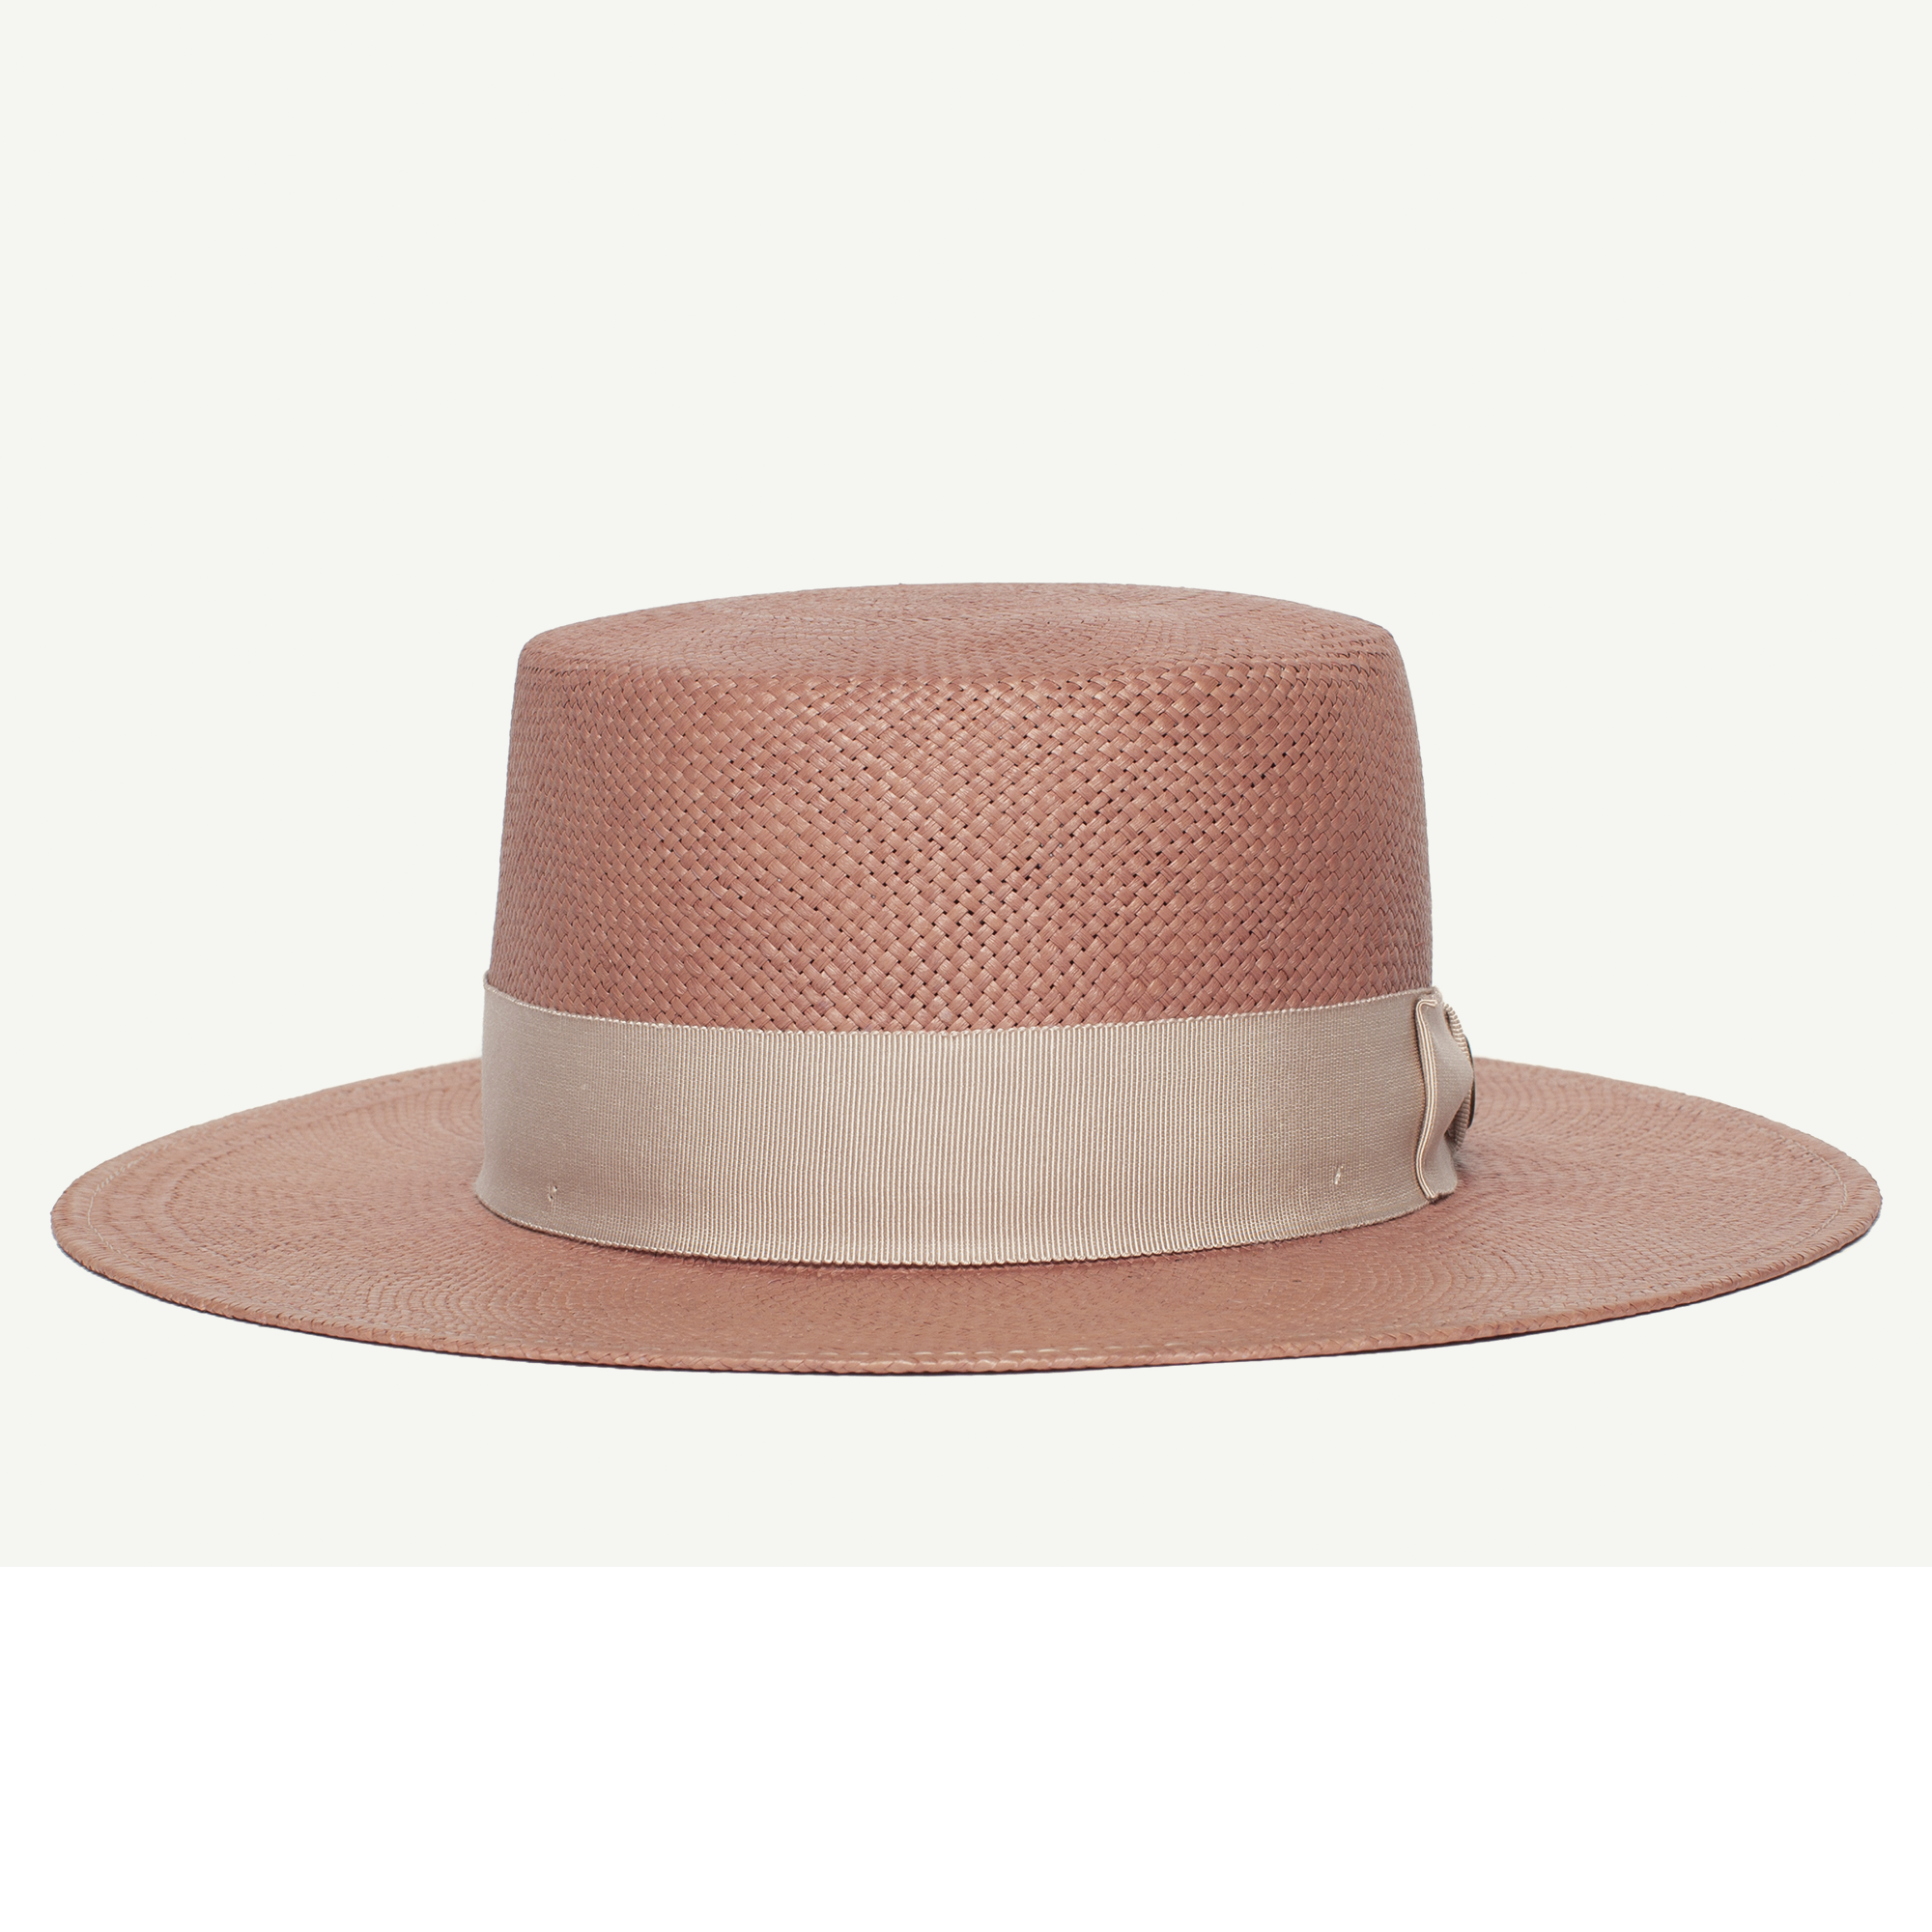 221cb4eab Kai Kai in 2019   HAT GAME   Hats for men, Boater hat, Hat for man